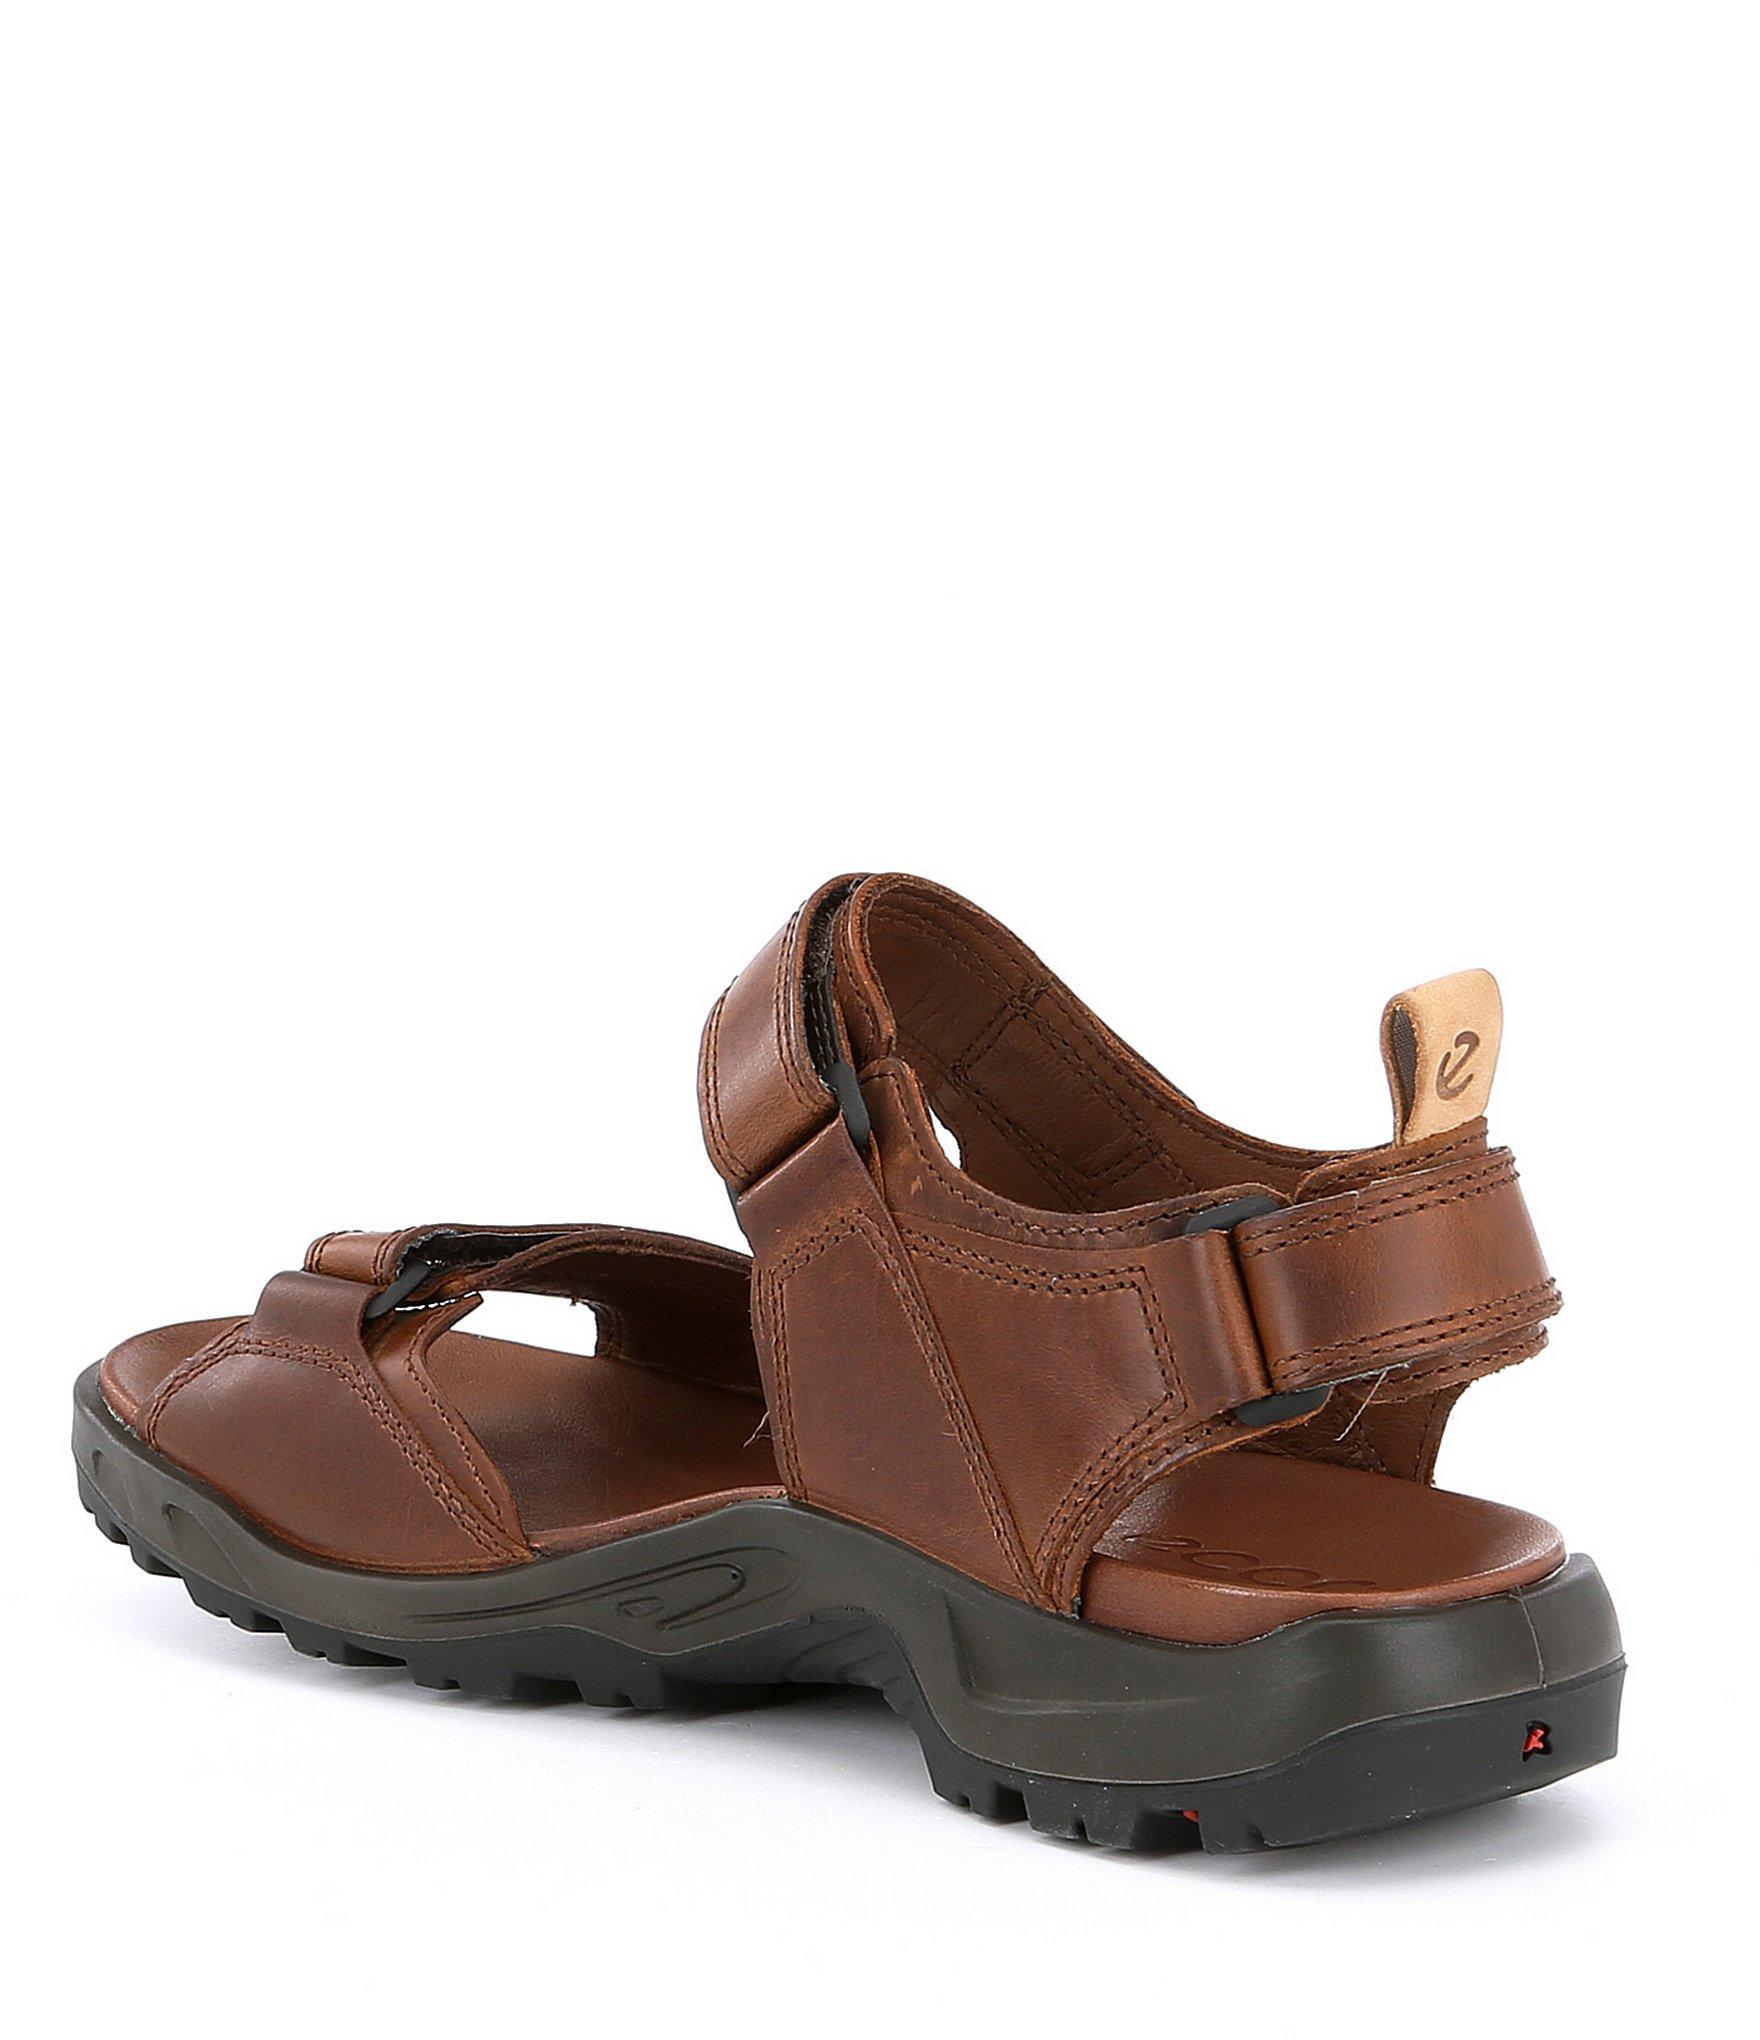 Offroad Brown Men Lyst Men's Premium For In Ecco Sandals Yg6f7bIyv